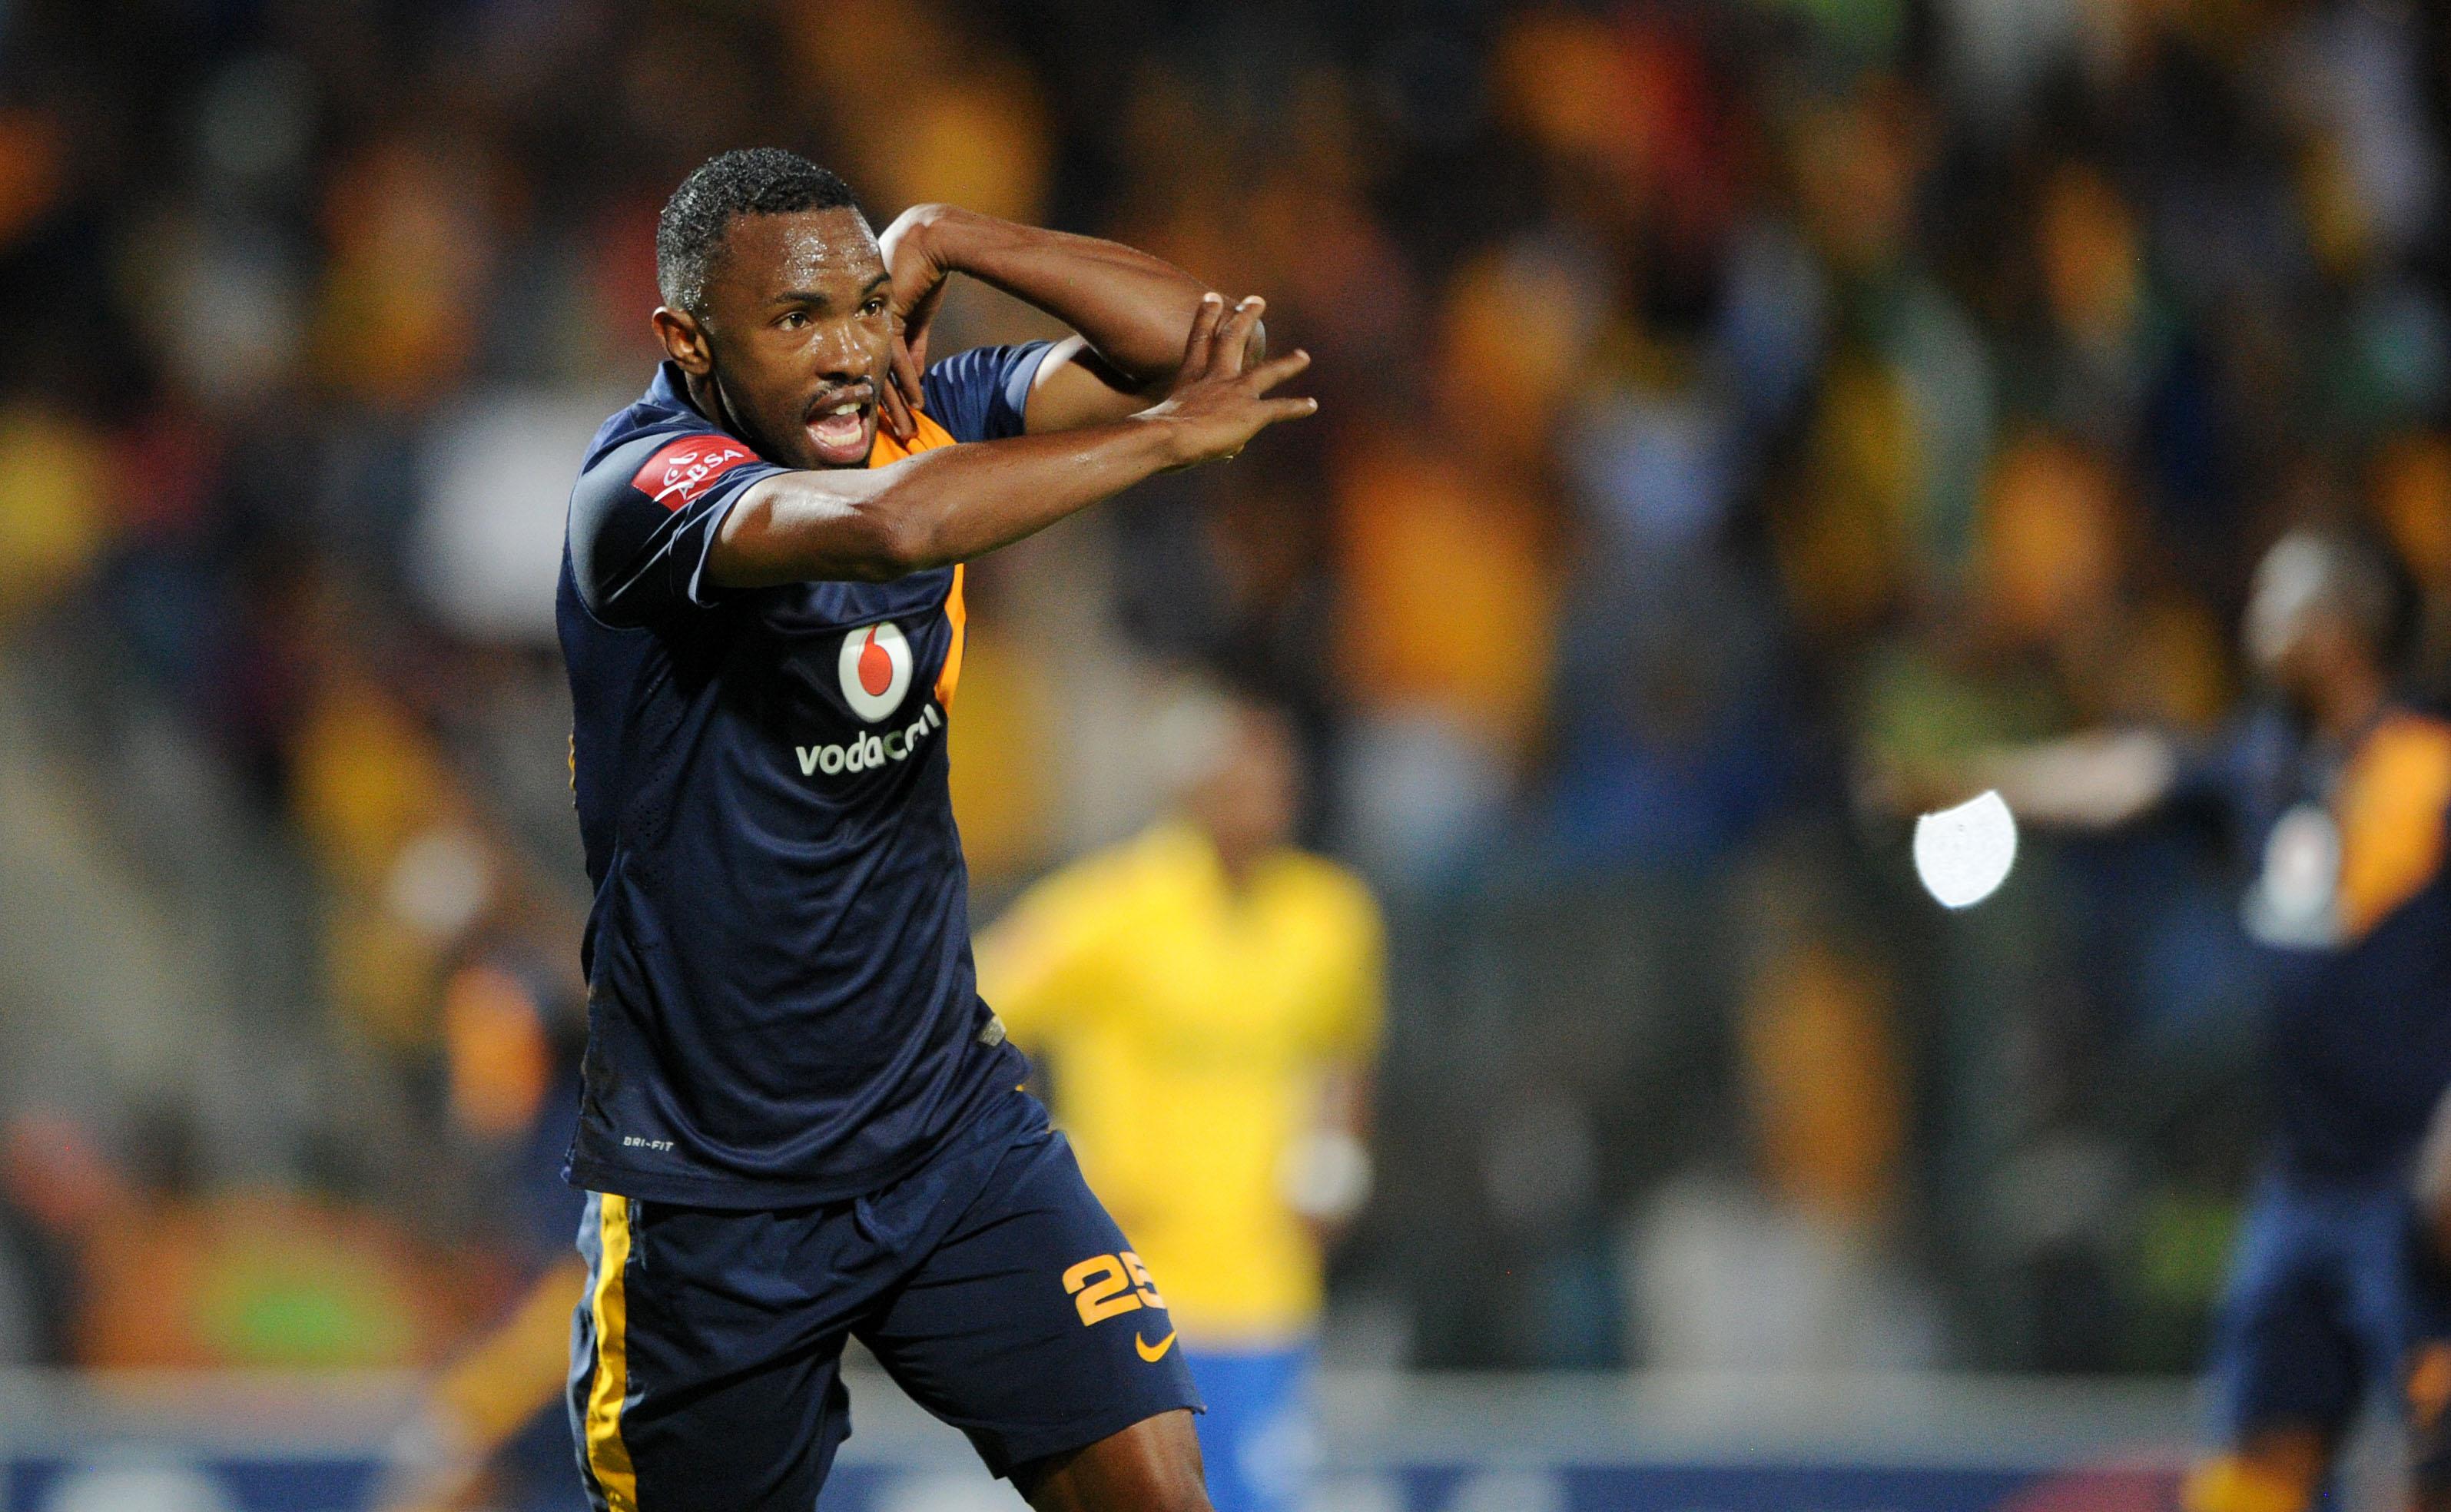 Bernard Parker celebrates his goal against Sundowns. Pic: Muzi Ntombela/BackpagePix